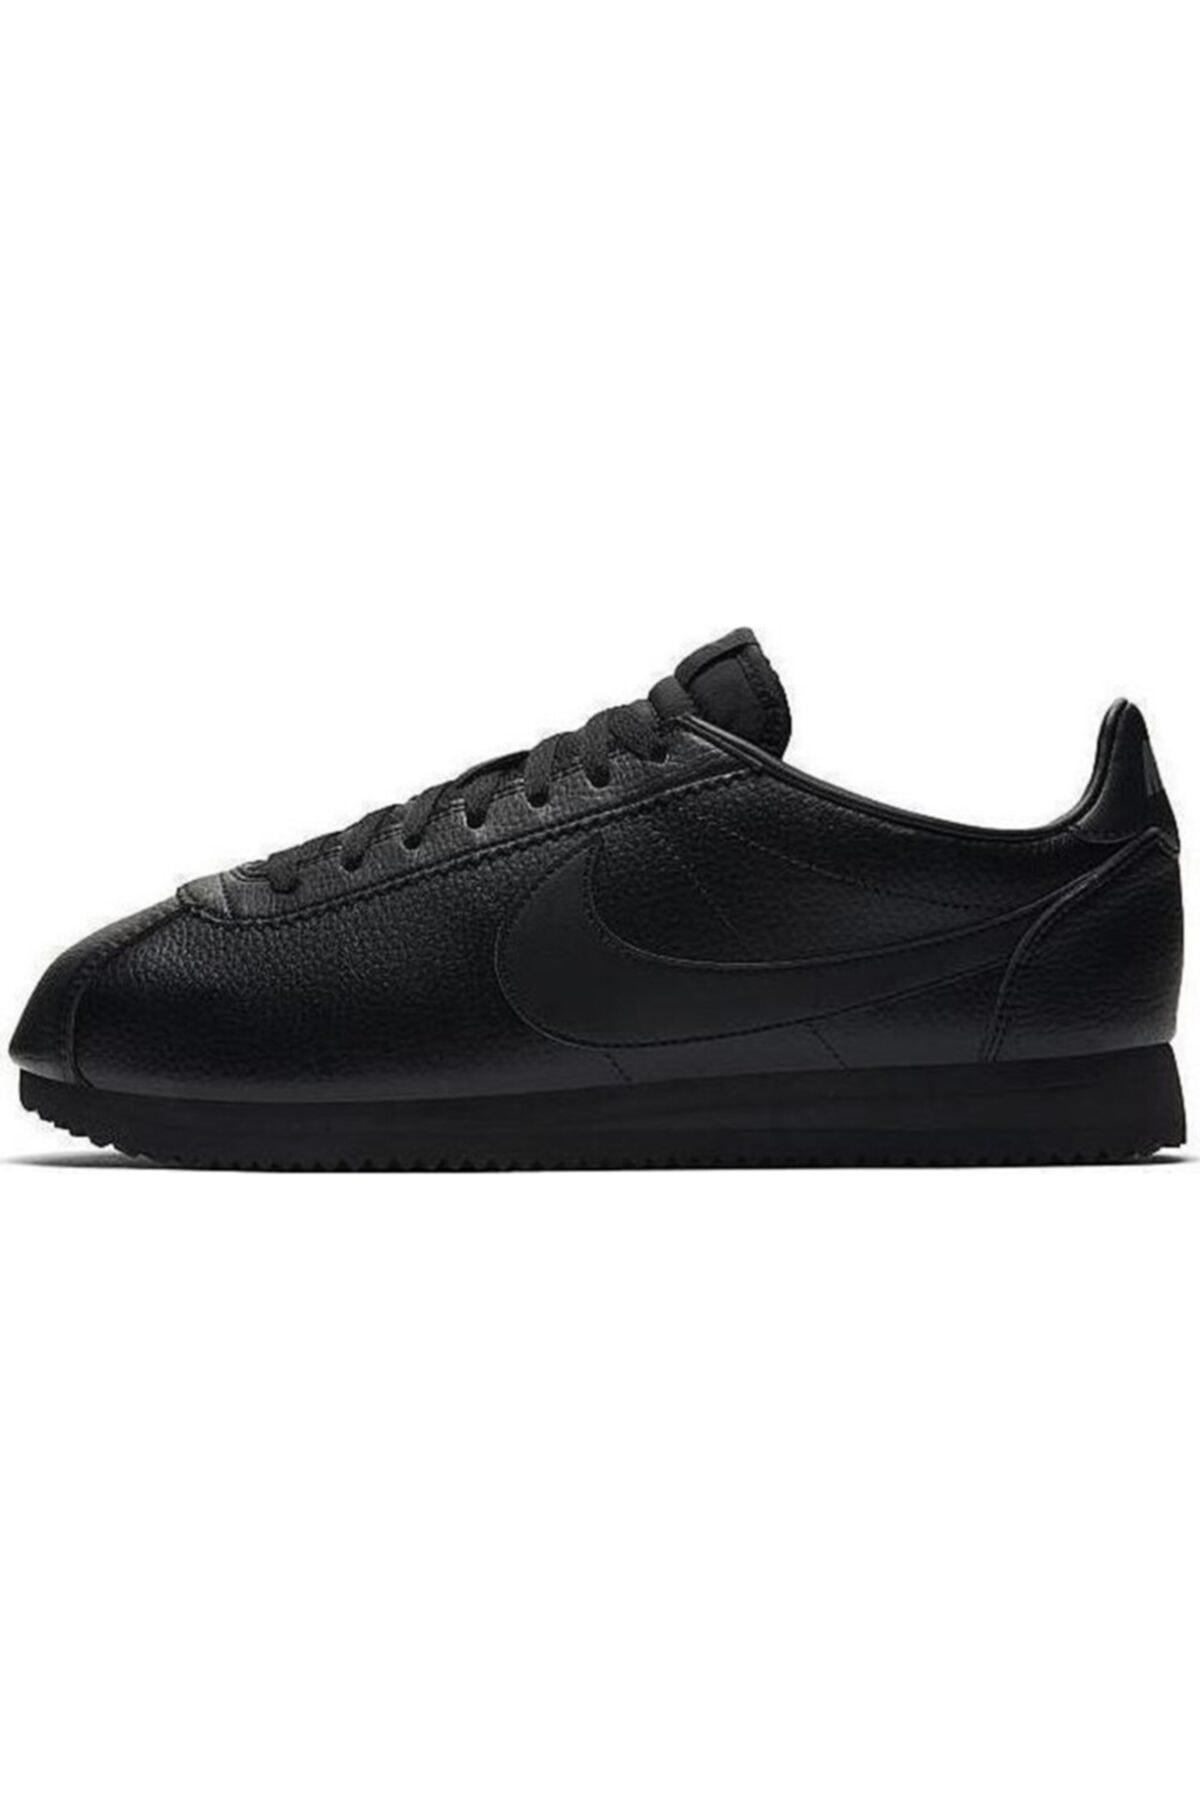 Nike Cortez Leather 1